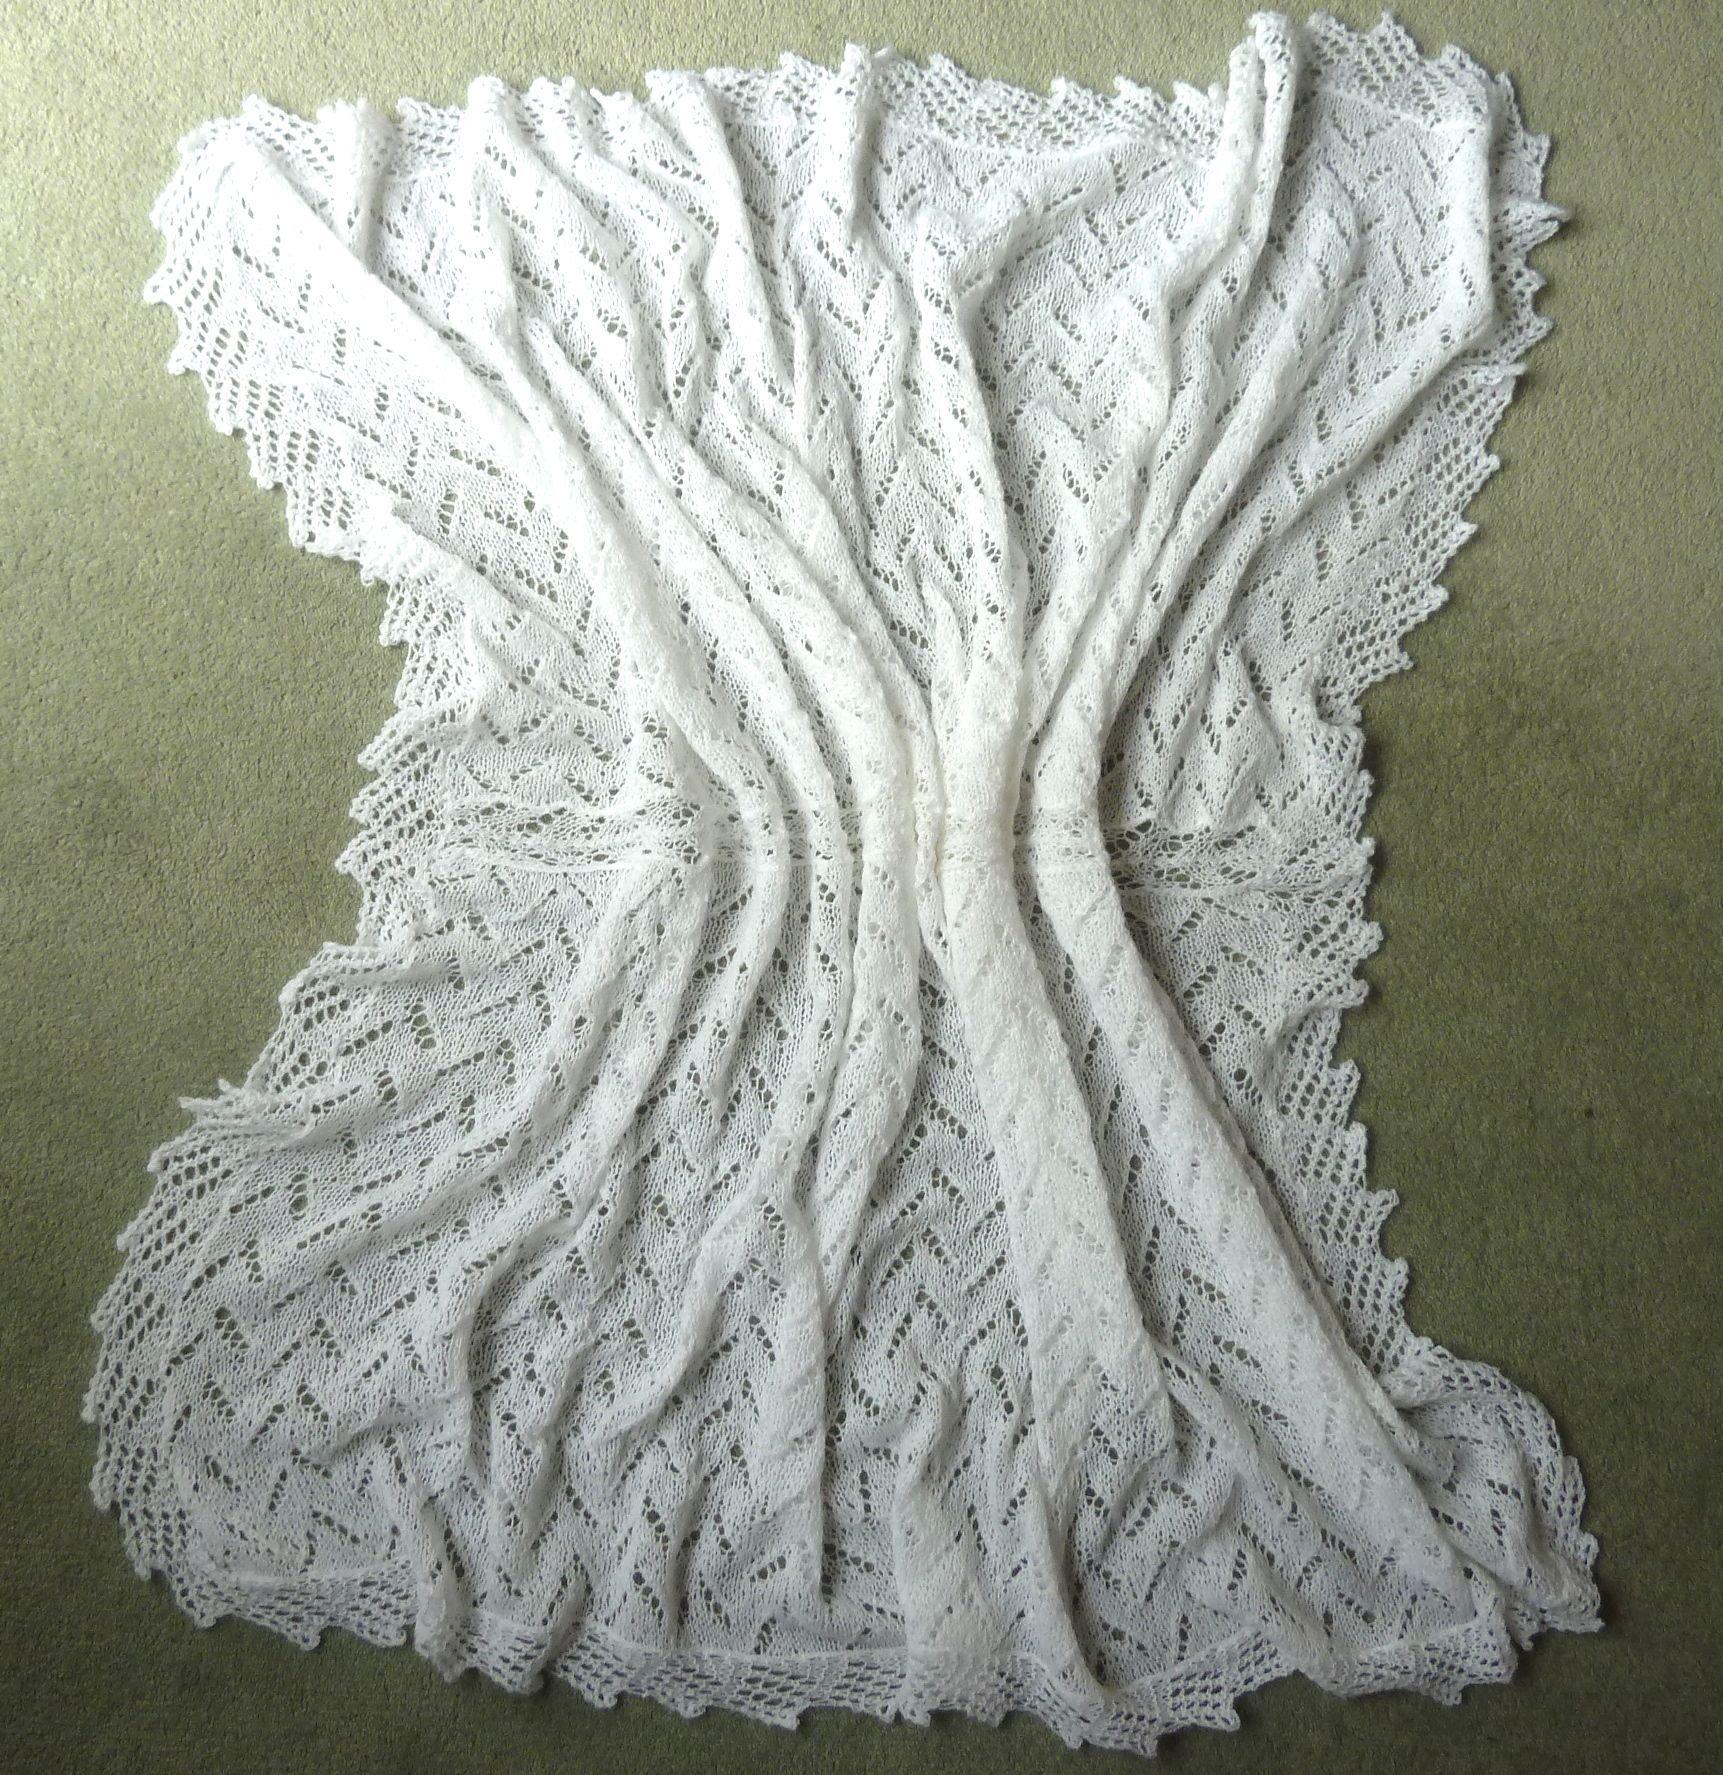 A fine knit baby shawl/blanket | Baby Shawls | Pinterest ...